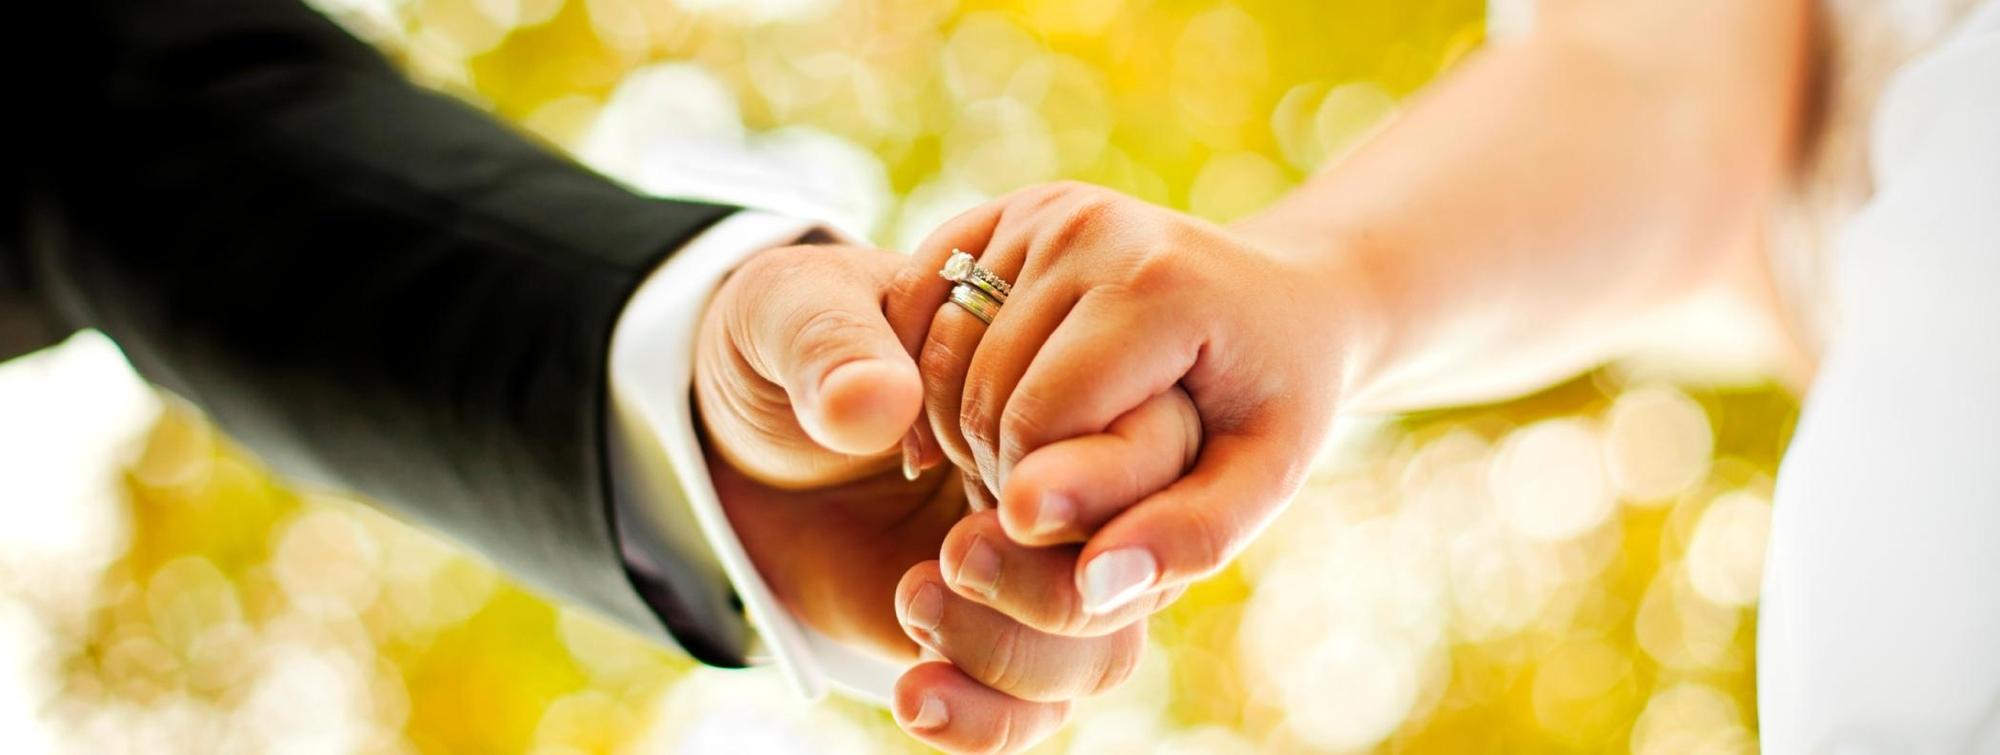 20130828-085706-anniversaire-mariage-entete-2100-x-2100